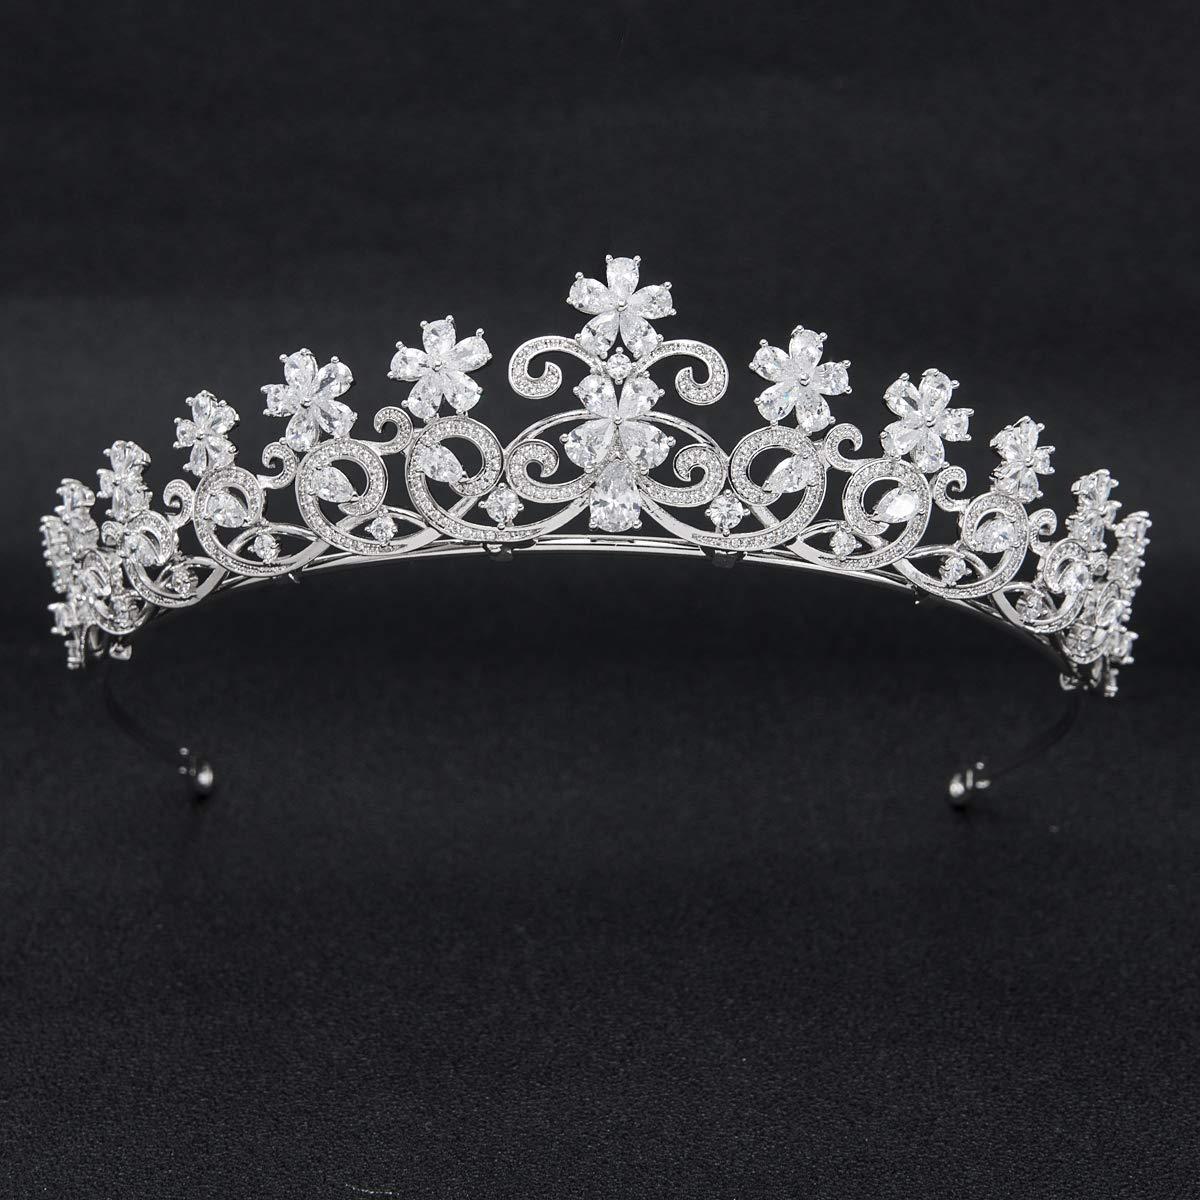 Flowers Cubic Zirconia CZ Wedding Bridal Tiara Crown Diadem Women Hair Accessories CH10052